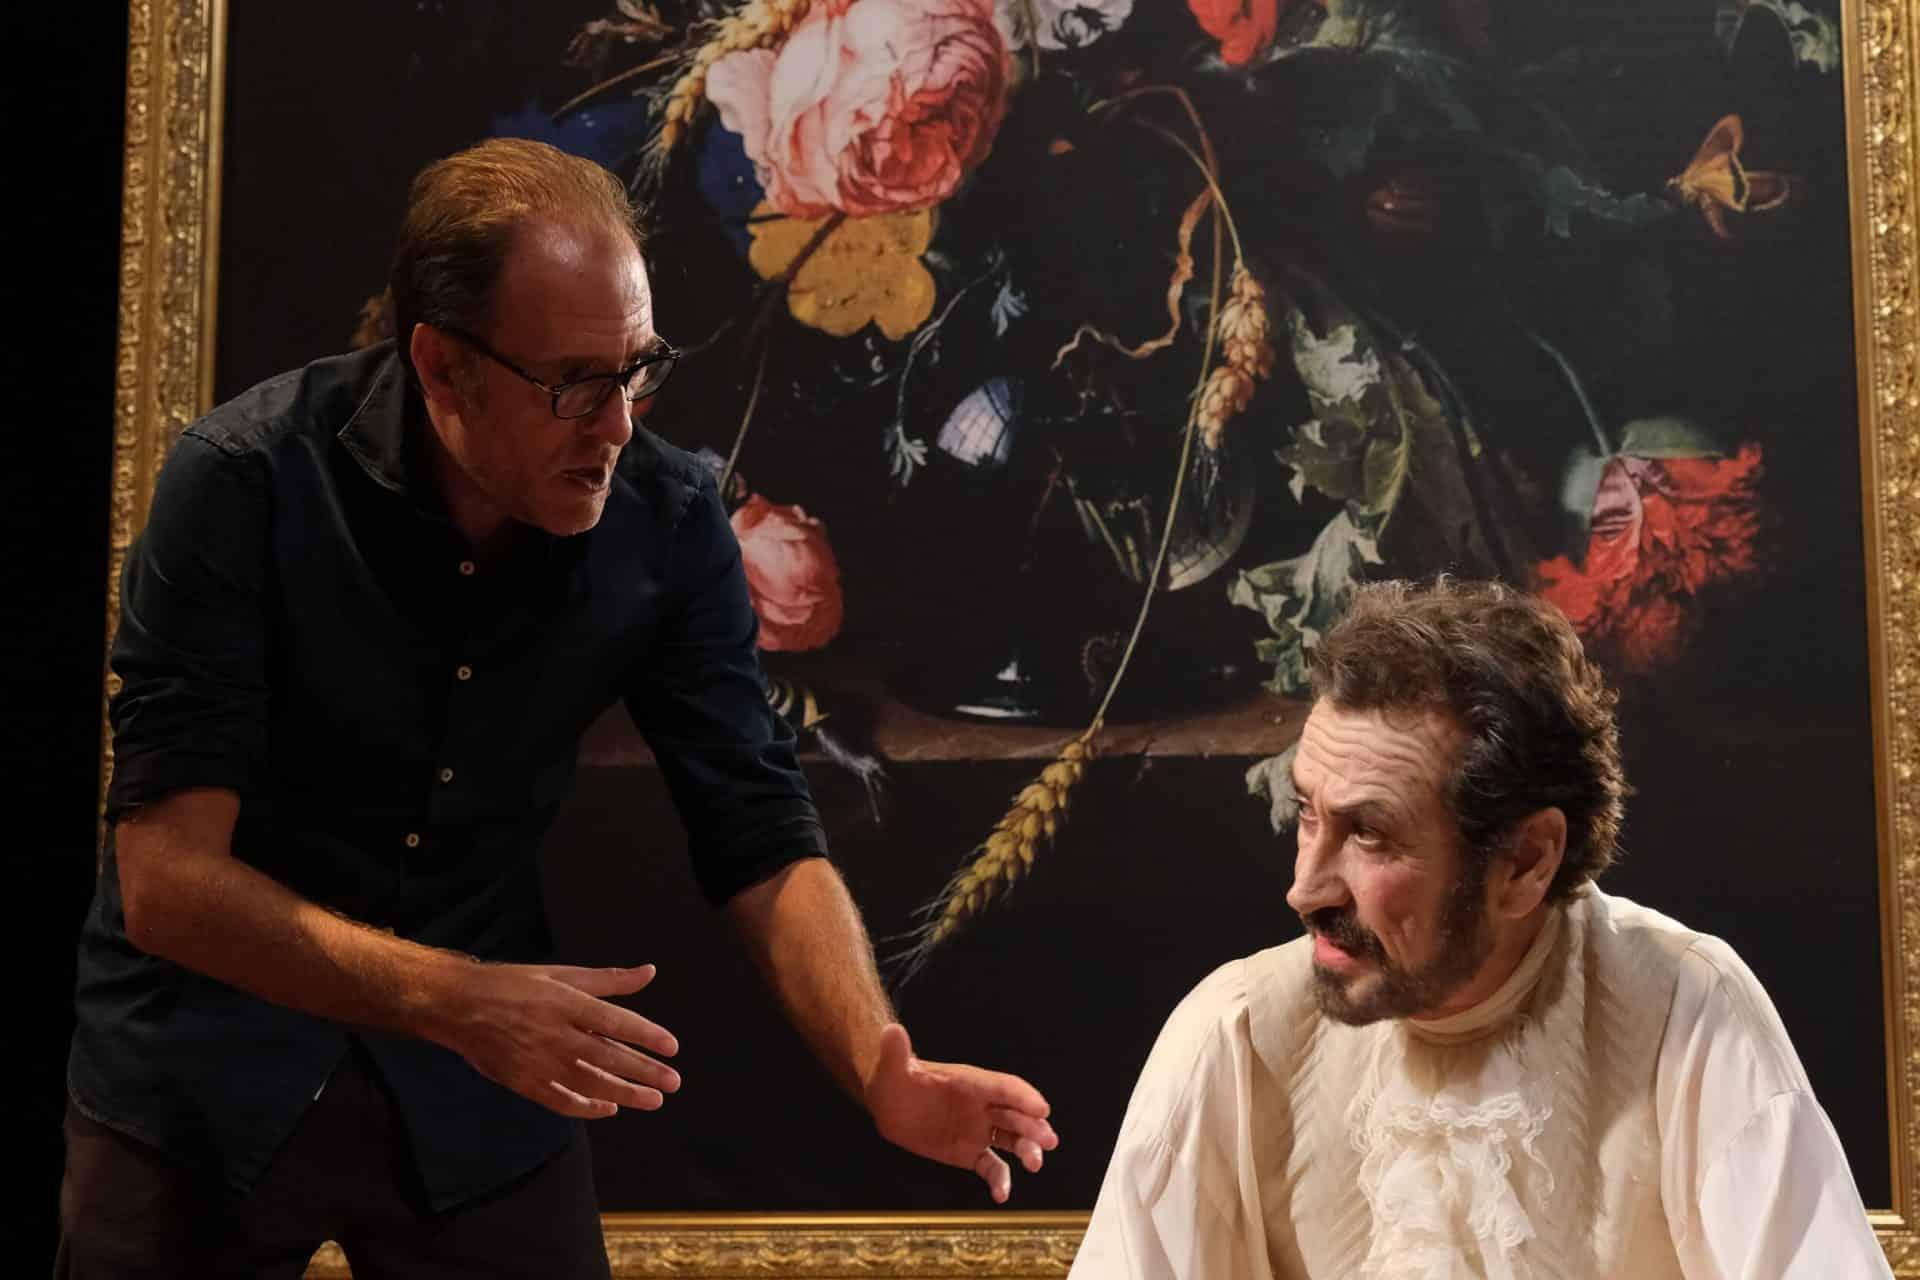 Marco Giallini Valerio Mastandrea - Cinematographe.it